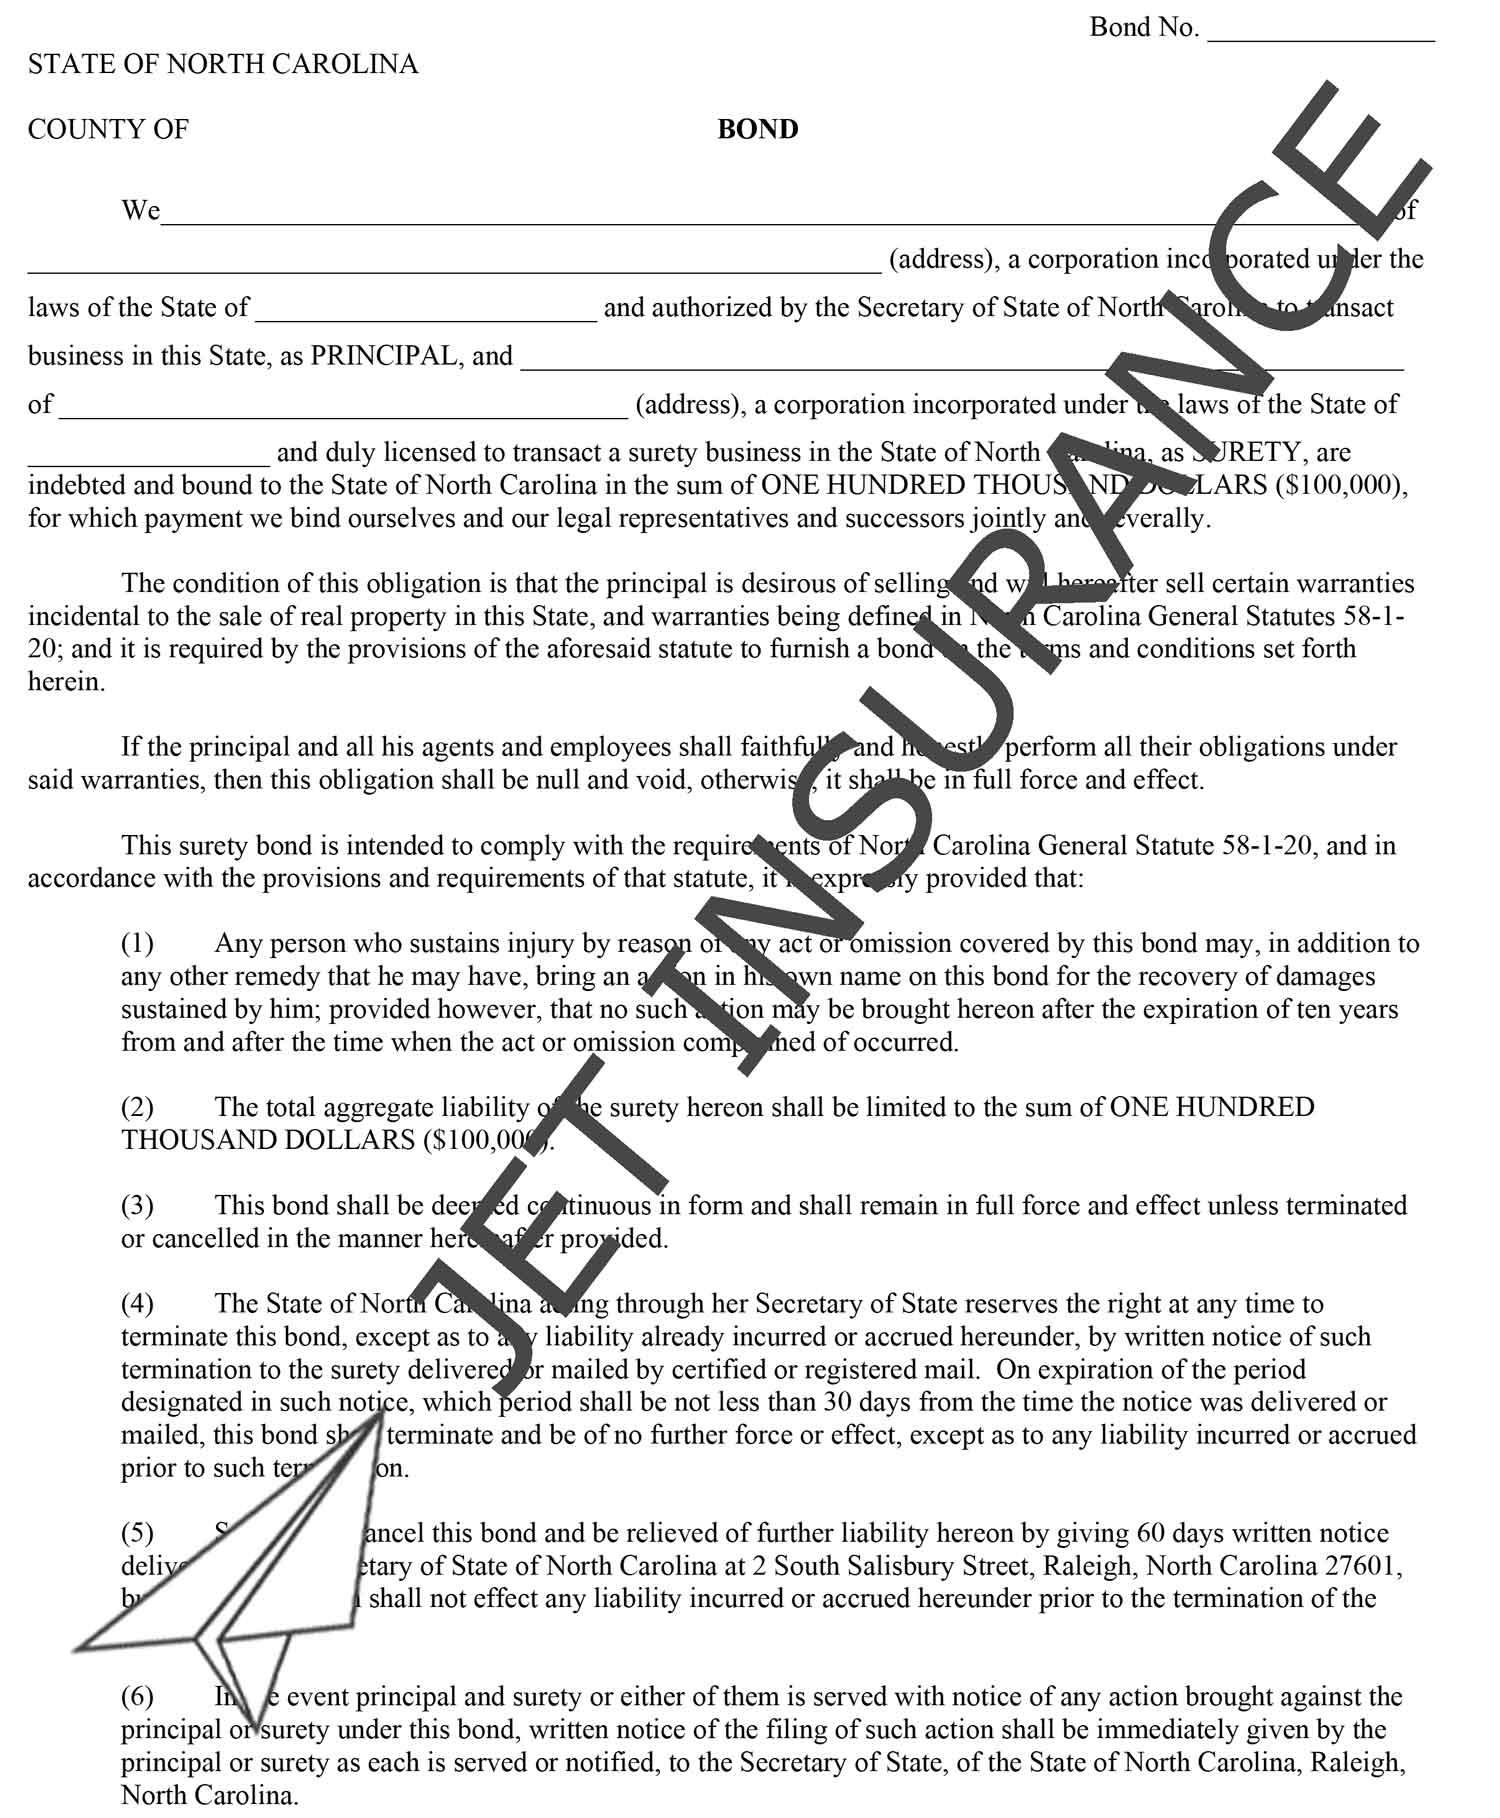 North Carolina Property Warranty Bond Form